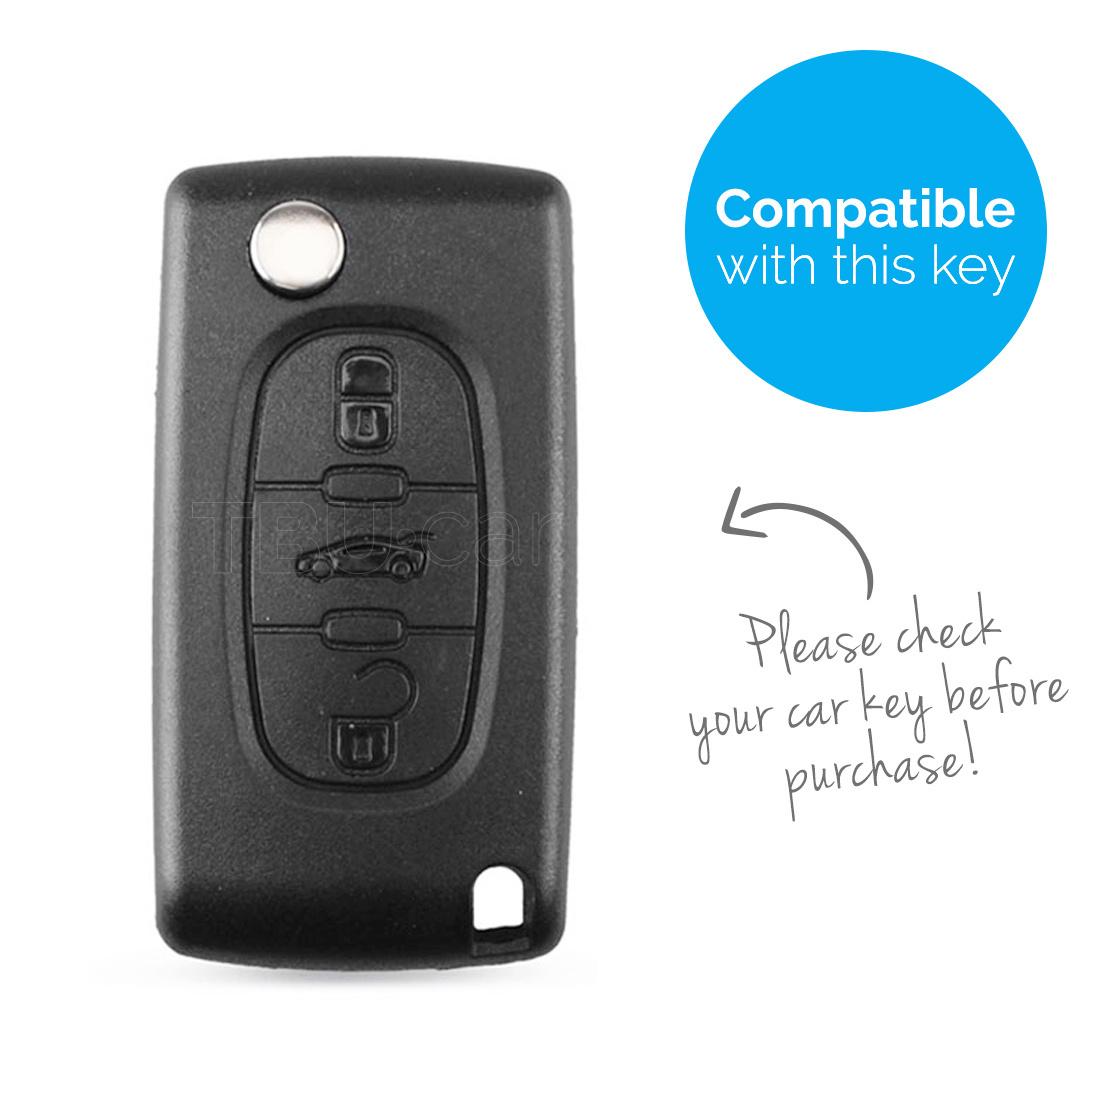 TBU car TBU car Sleutel cover compatibel met Lancia - Silicone sleutelhoesje - beschermhoesje autosleutel - Wit